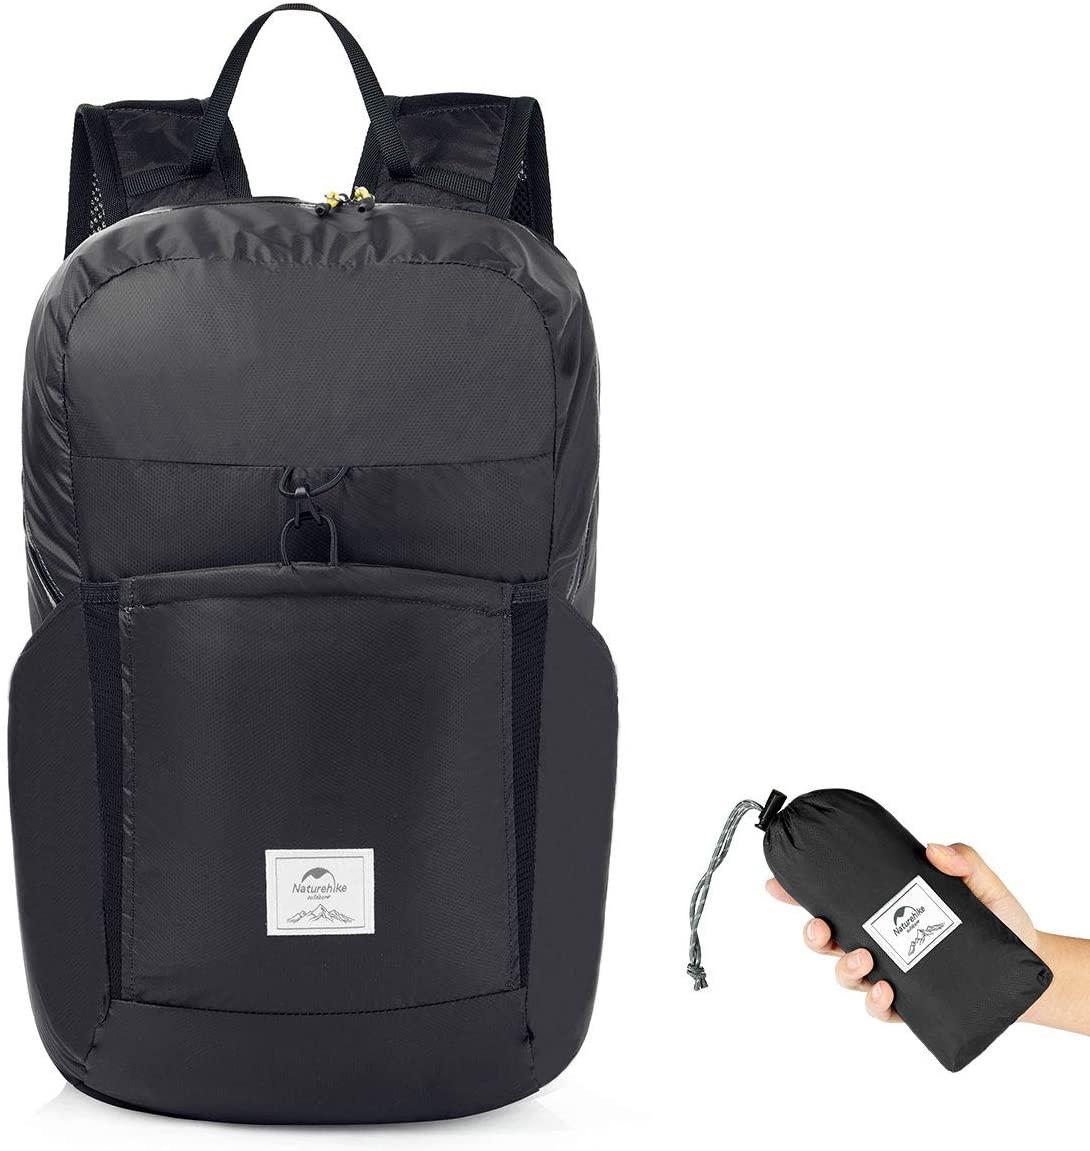 Naturehike 18L 25L Rainproof Ultralight Foldable Lightweight Packable Backpack